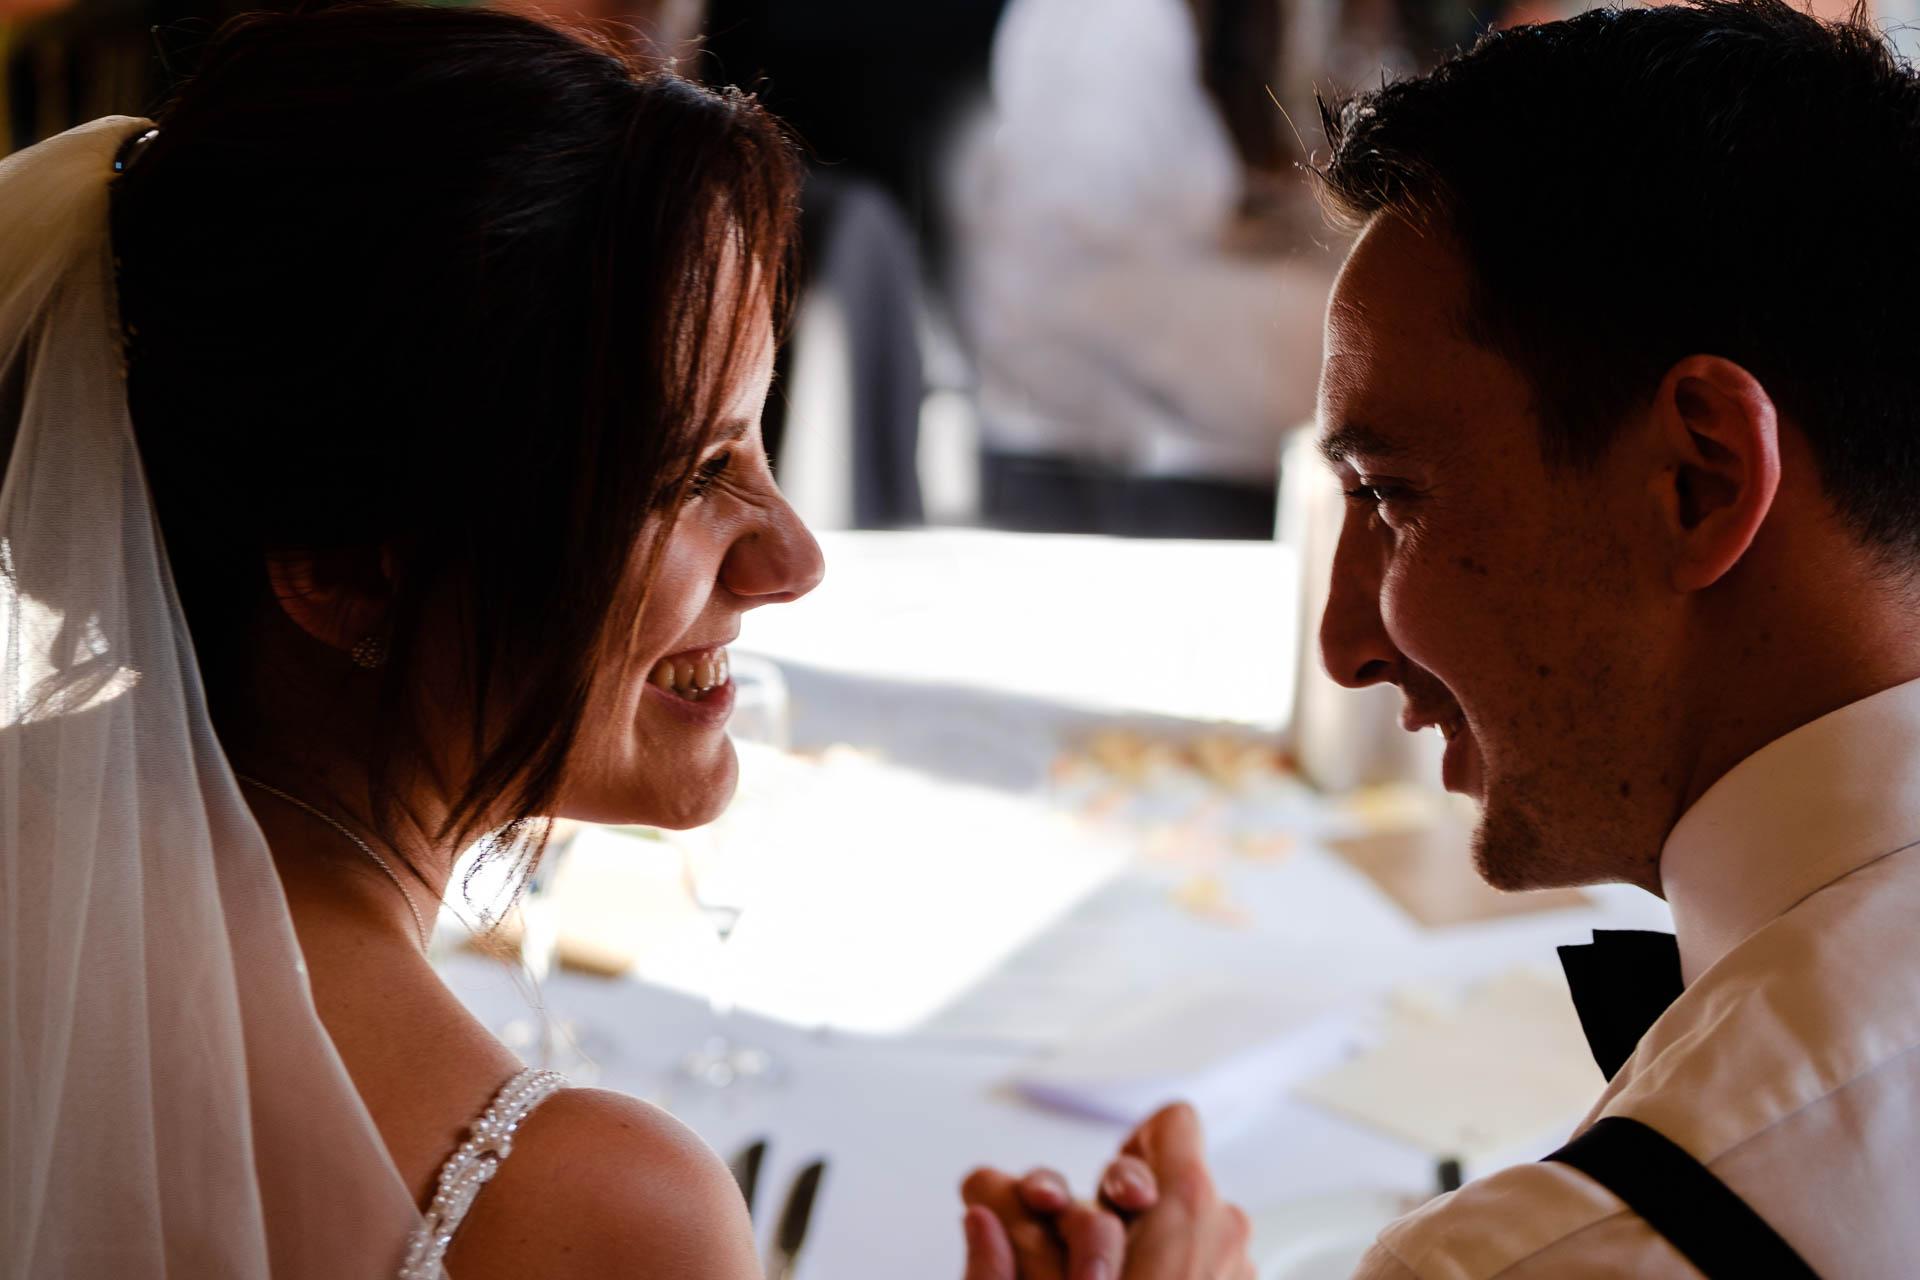 orchardleigh house wedding - Danni & Barney (383).jpg